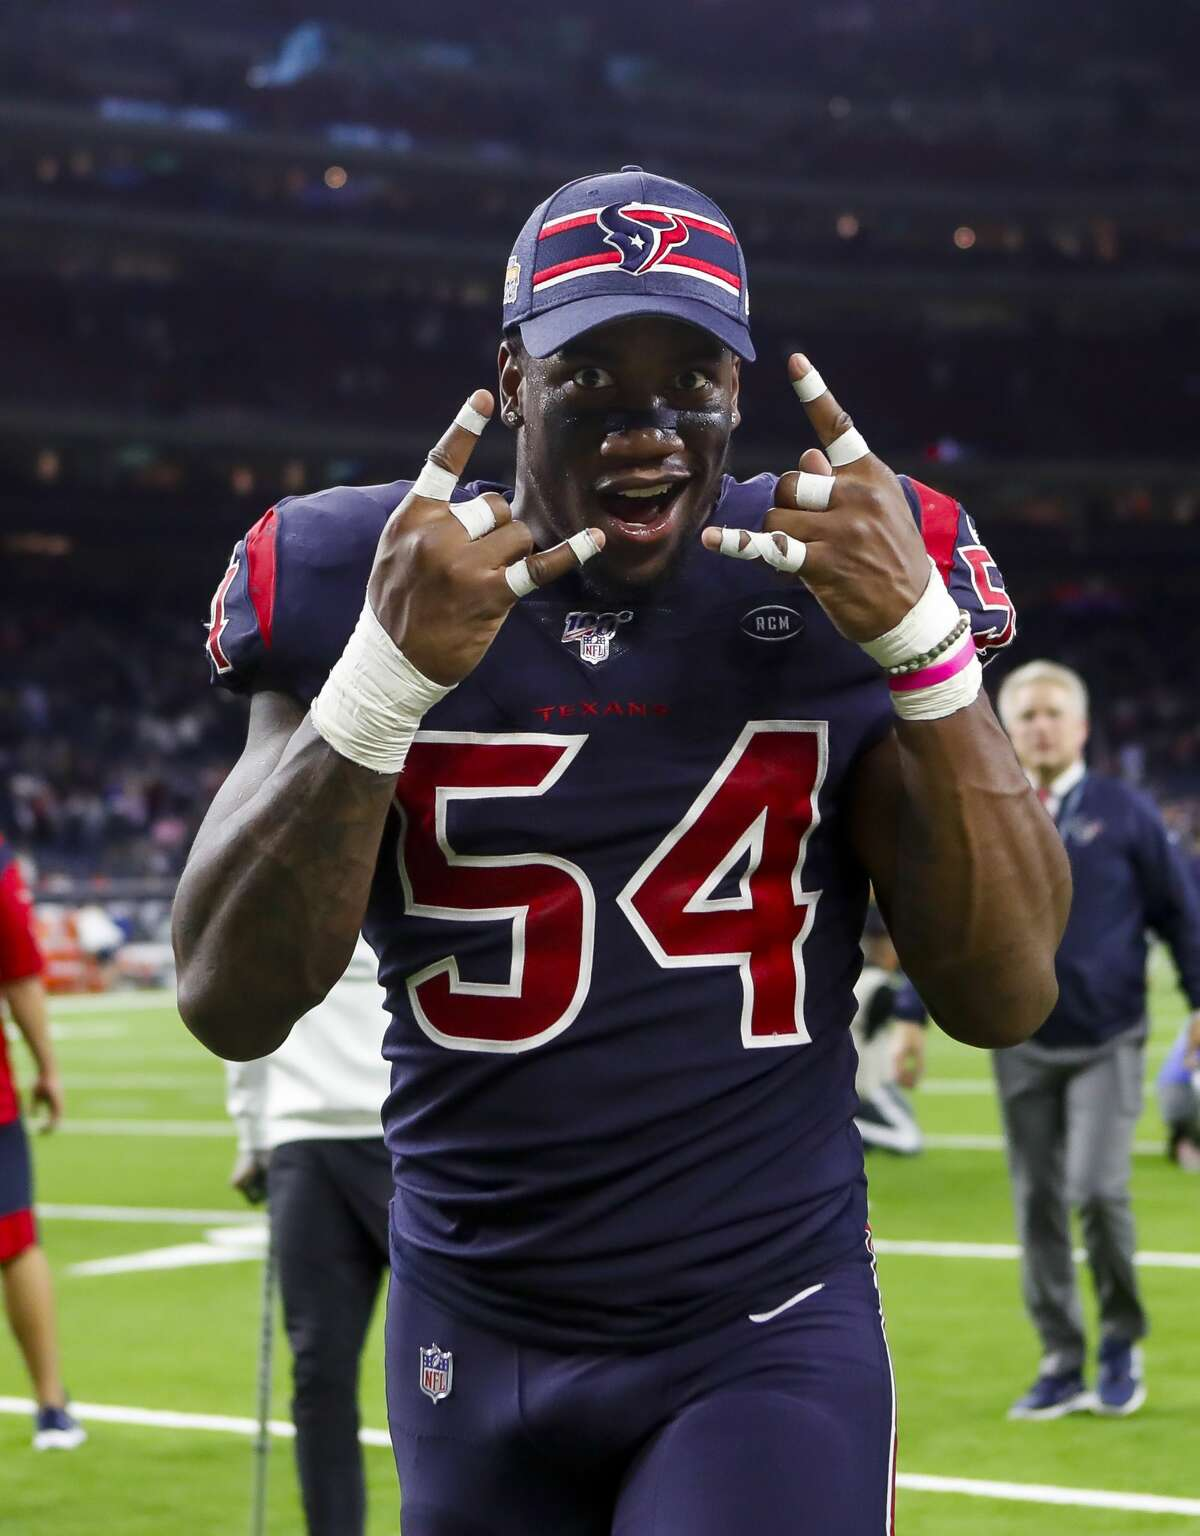 Houston Texans linebacker Jake Martin (54) celebrates following the Texans 28-22 win over the New England Patriots at NRG Stadium on Sunday, Dec. 1, 2019, in Houston.